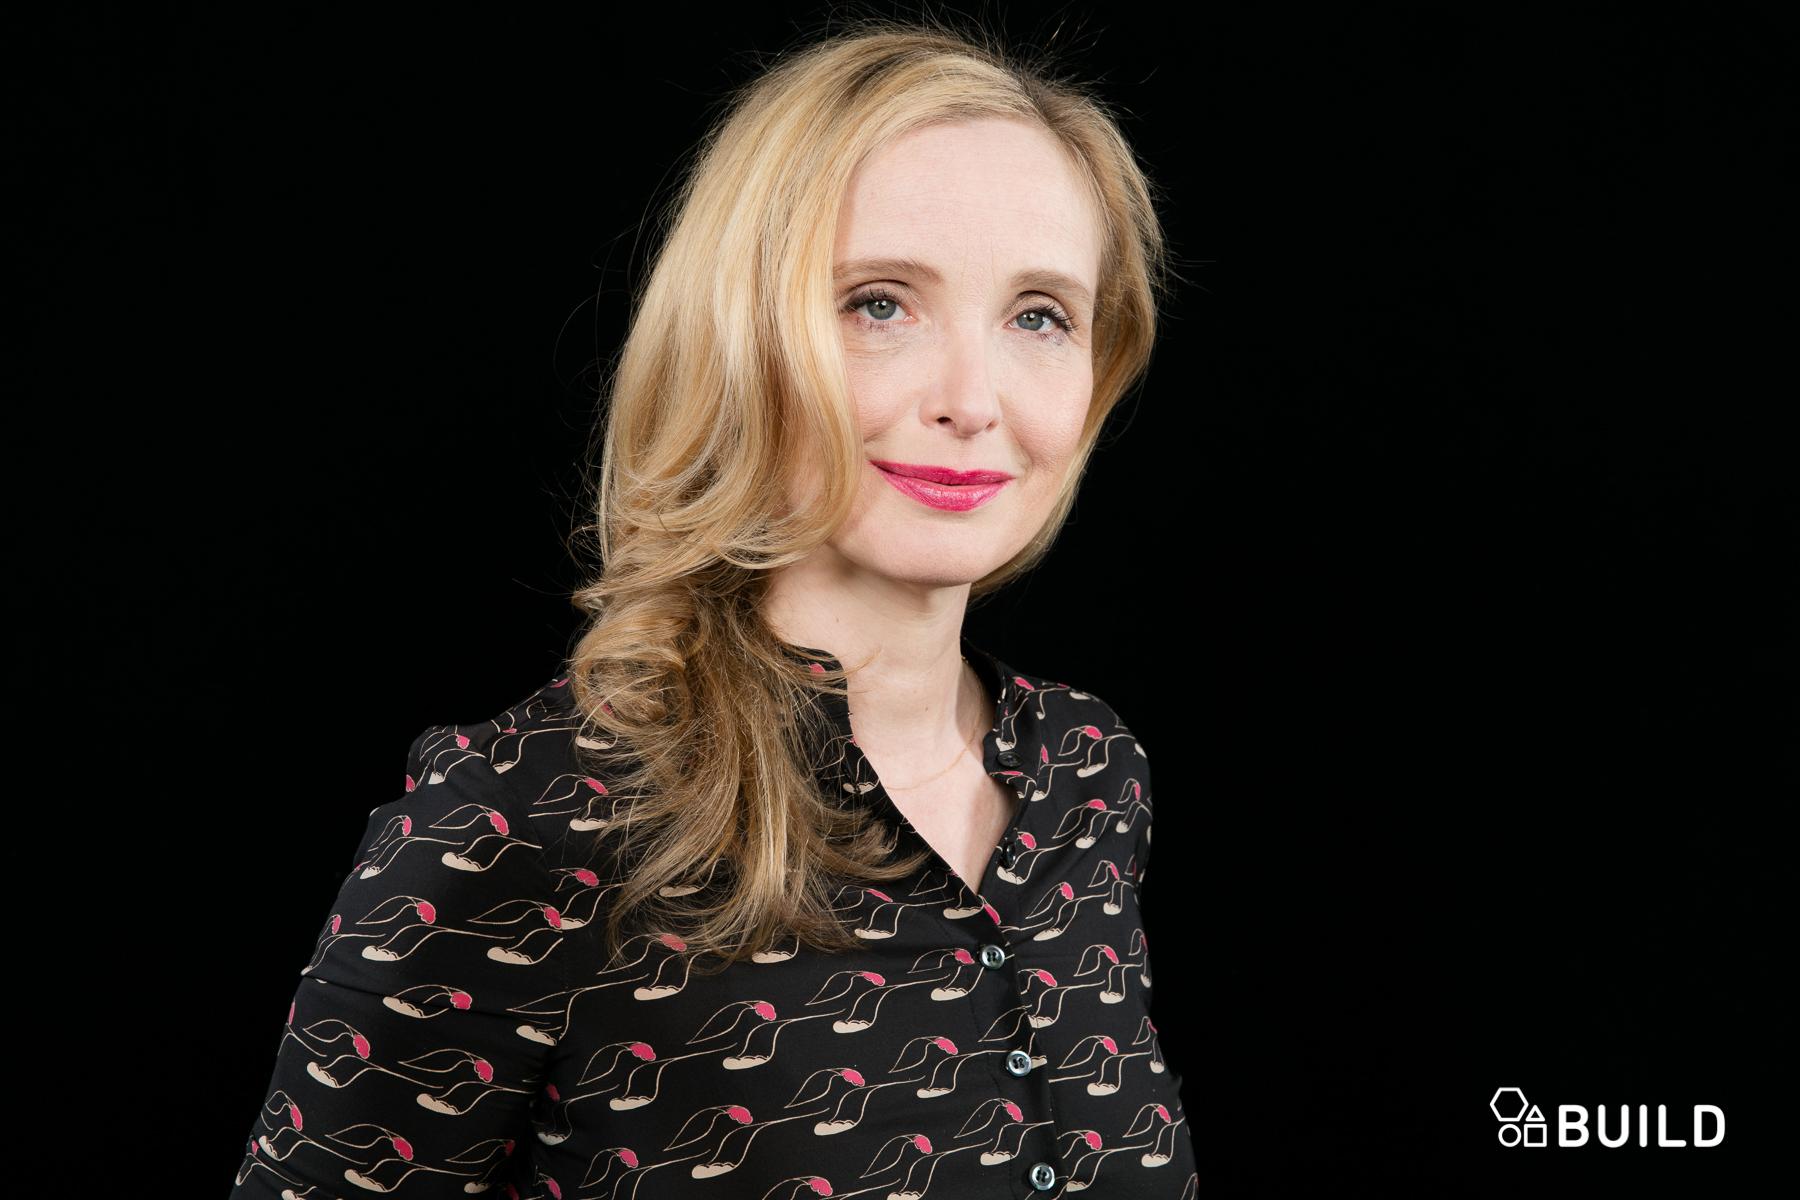 Hume Cronyn,Venus Terzo Hot pics & movies Pamela Hensley born October 3, 1950 (age 68),27. Fergie